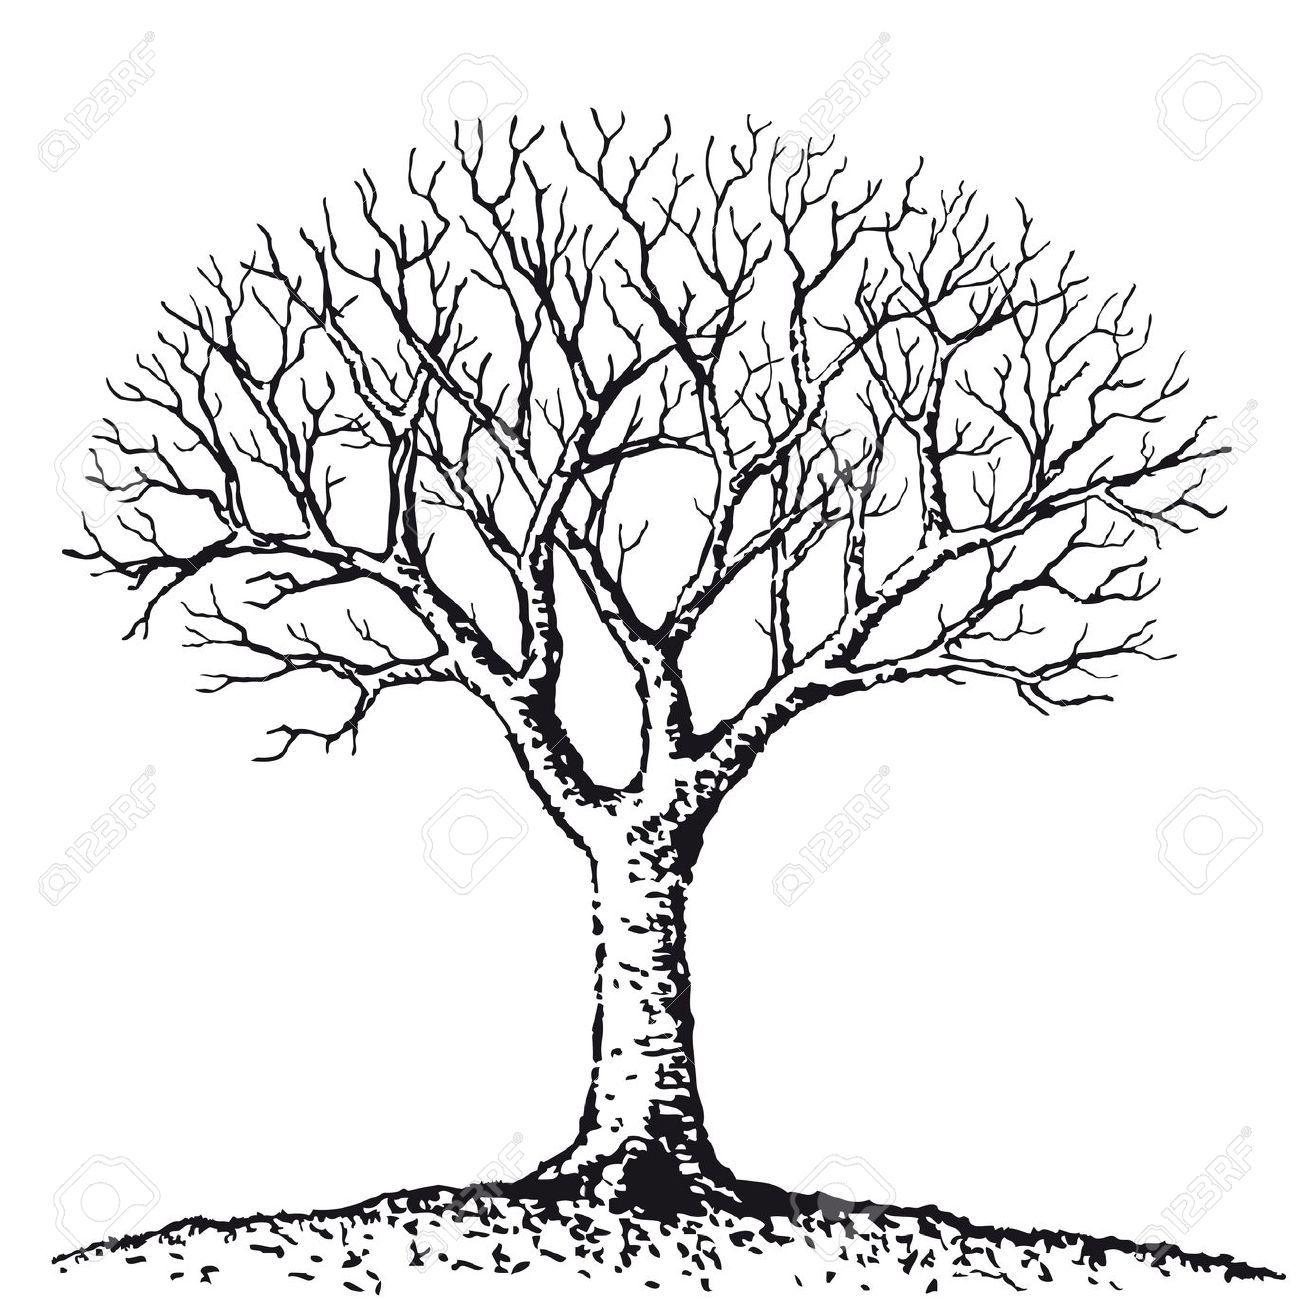 10526508-Bare-tree-Stock-Vector-trees.jpg (1300×1300